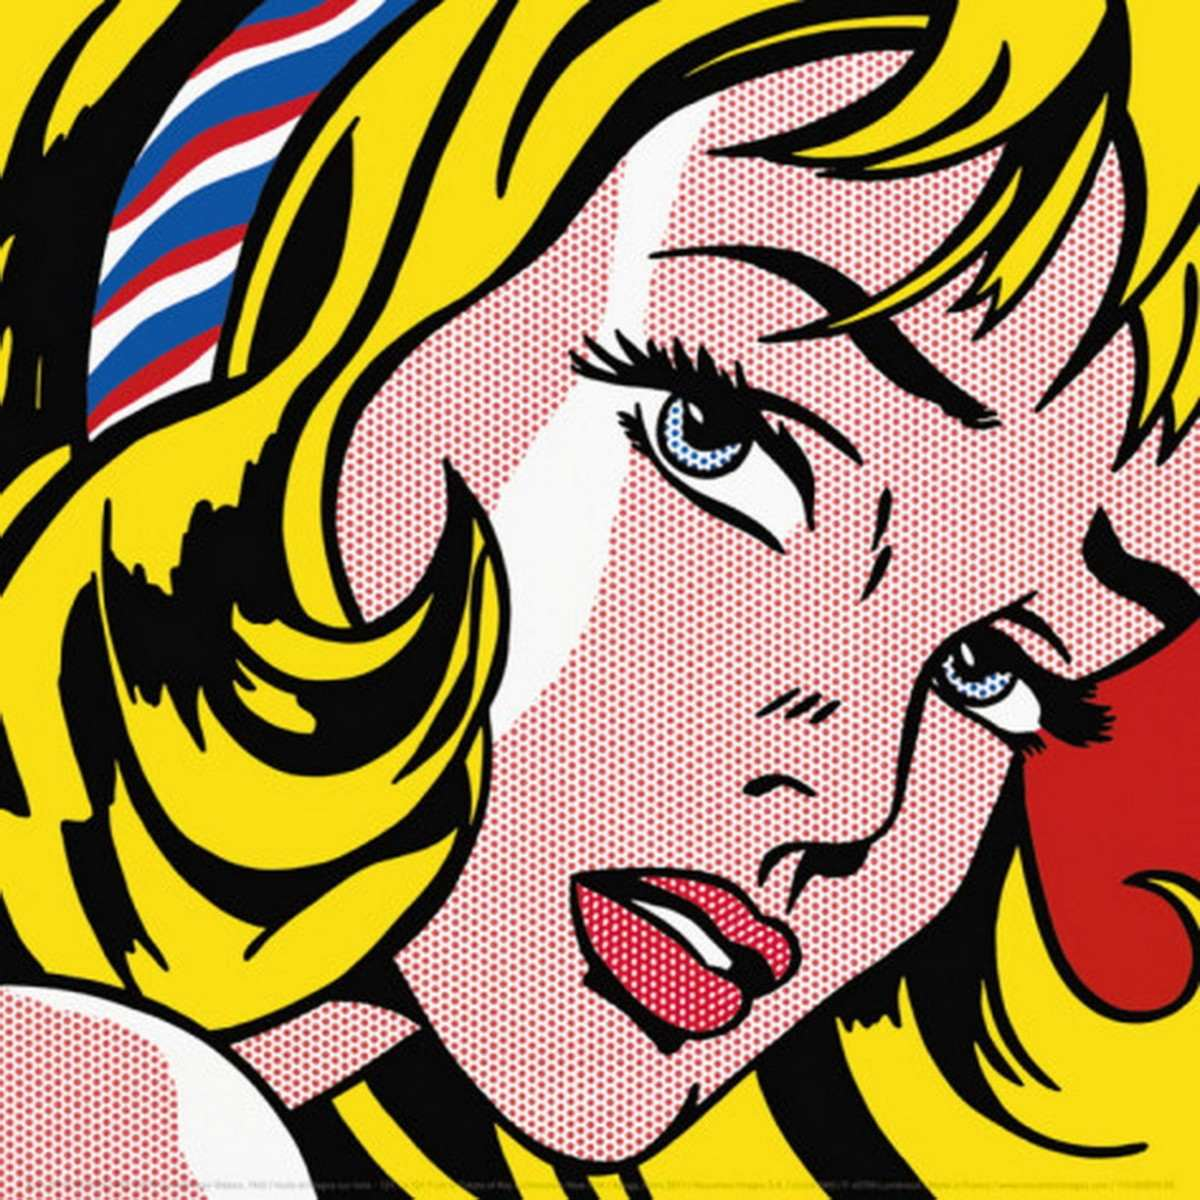 Arte pop dobleclic estudio de v deo y dise o - Cuadros pop art comic ...